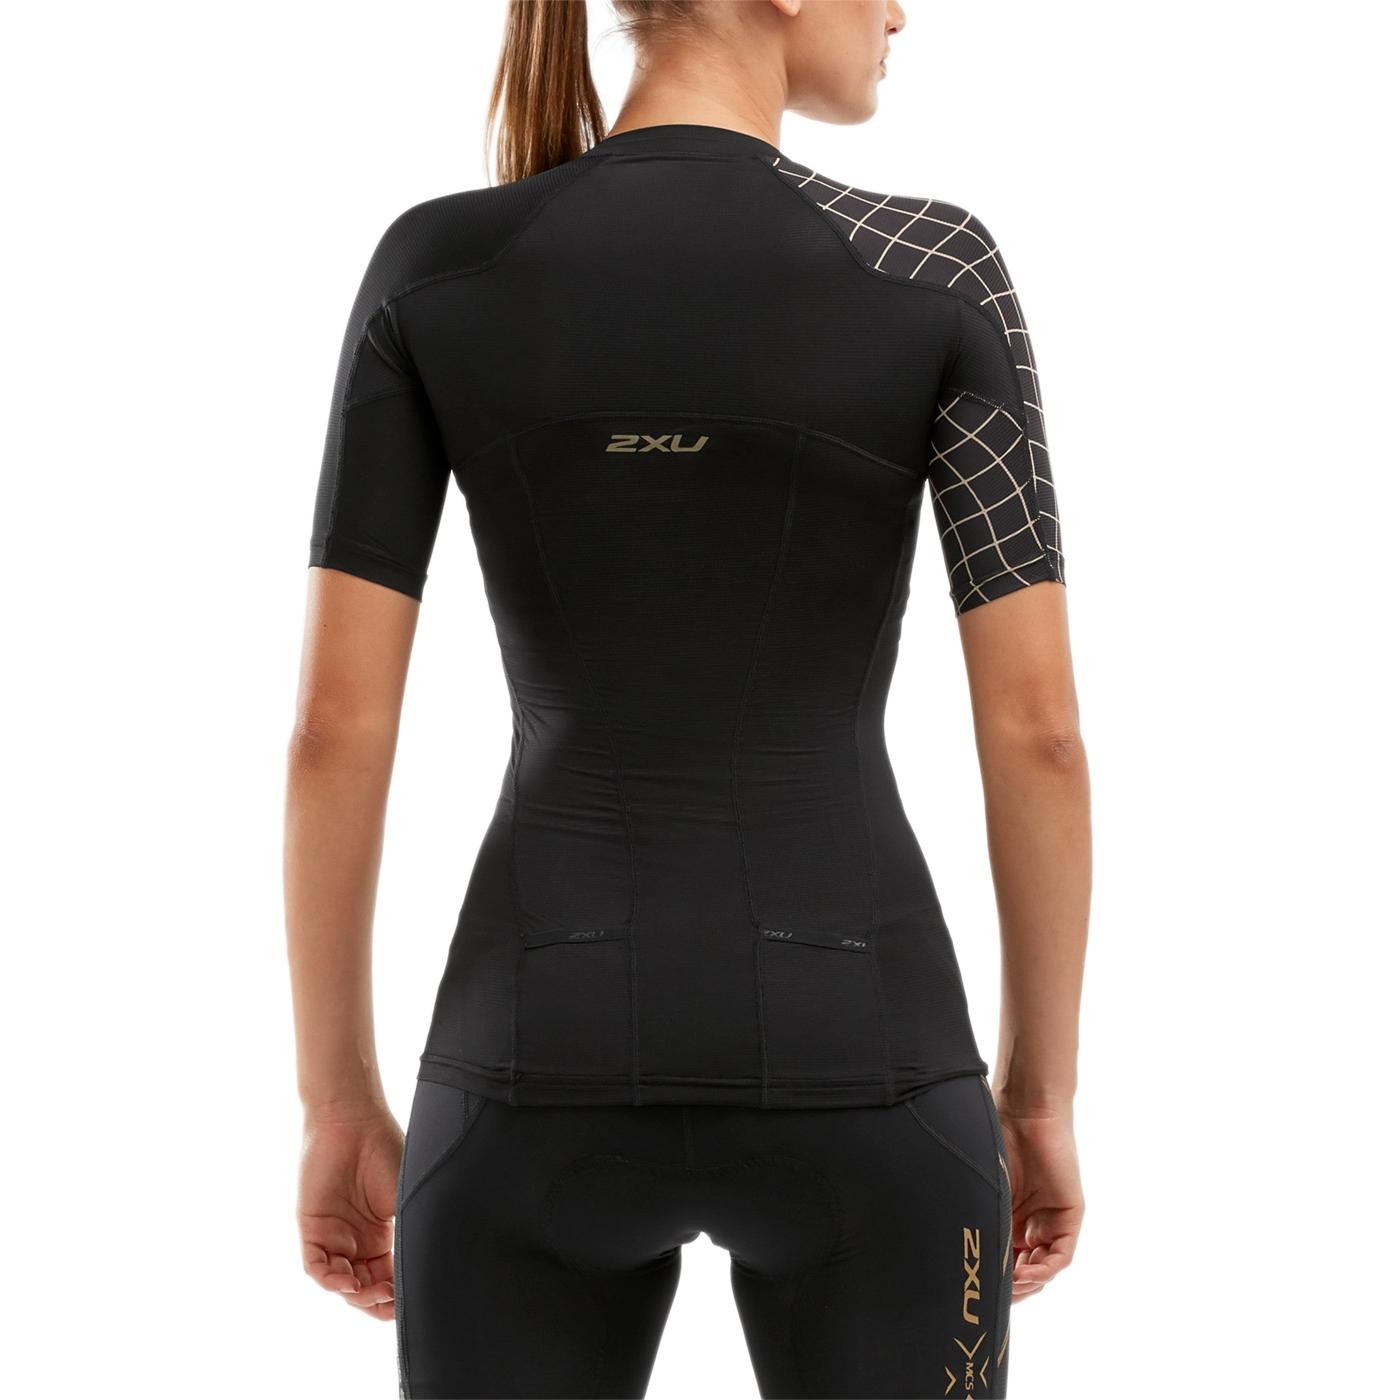 Imagen de 2XU Compression Sleeved Camiseta para mujer - black/gold